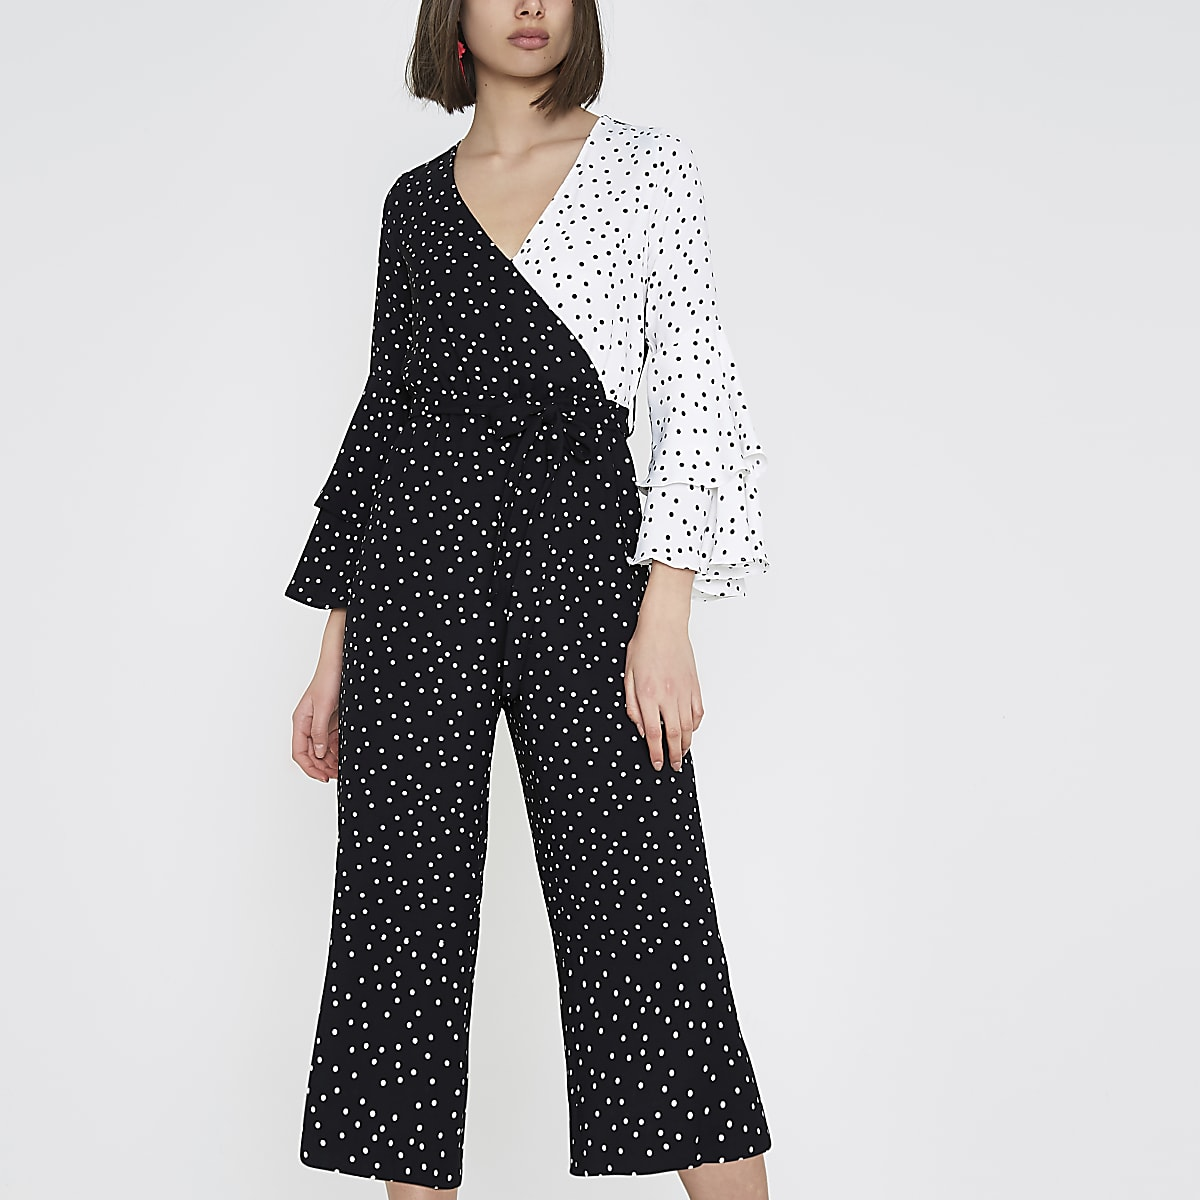 6c7190fd98 Black block polka dot frill culotte jumpsuit - Jumpsuits - Playsuits    Jumpsuits - women